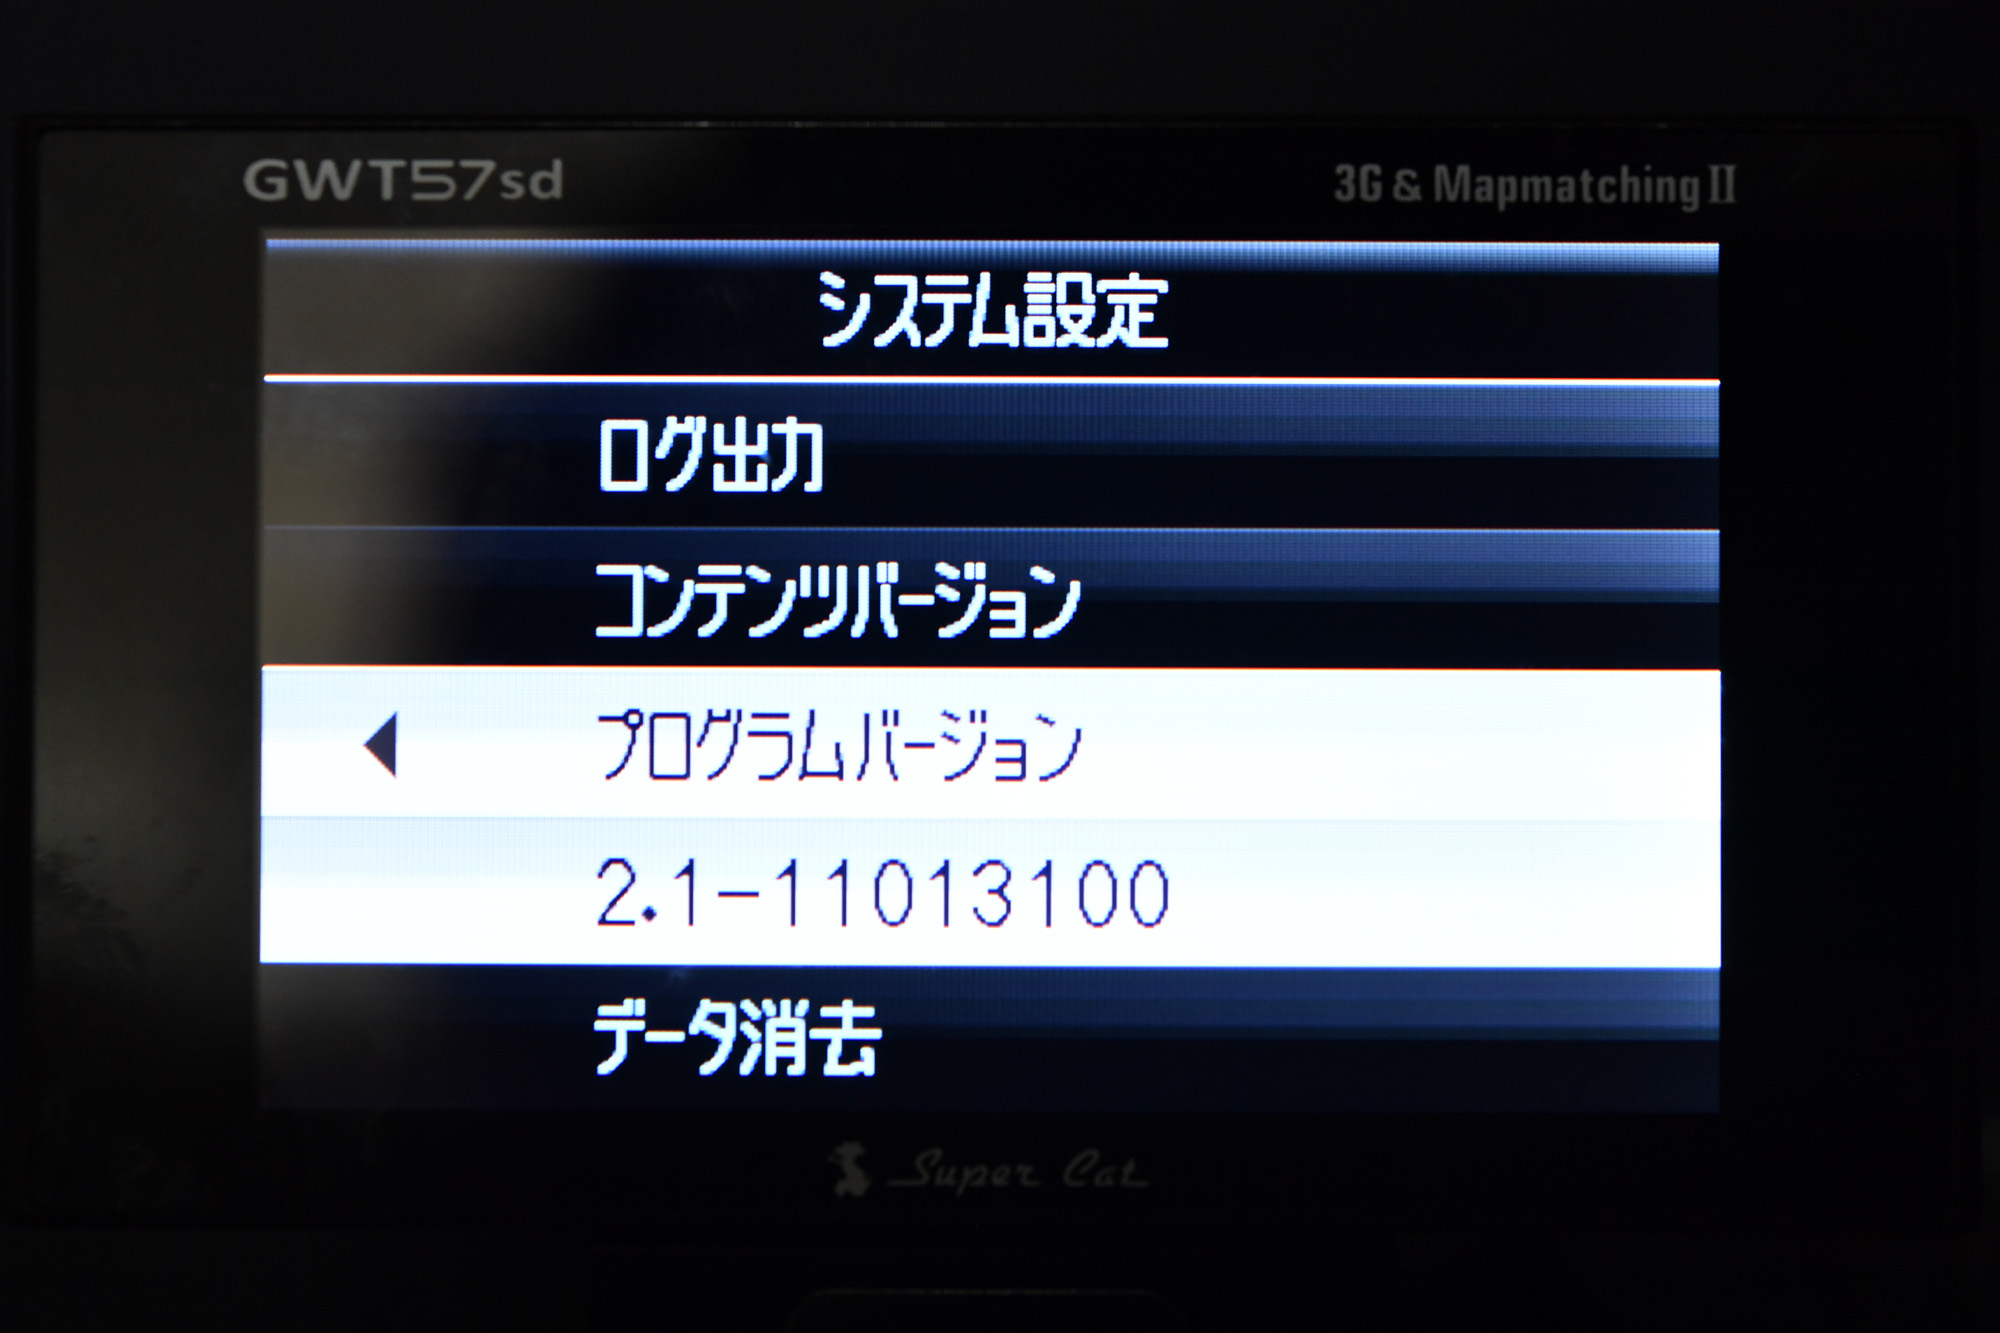 YUPITERU(ユピテル) GWT57sd ソフトウエアアップデート